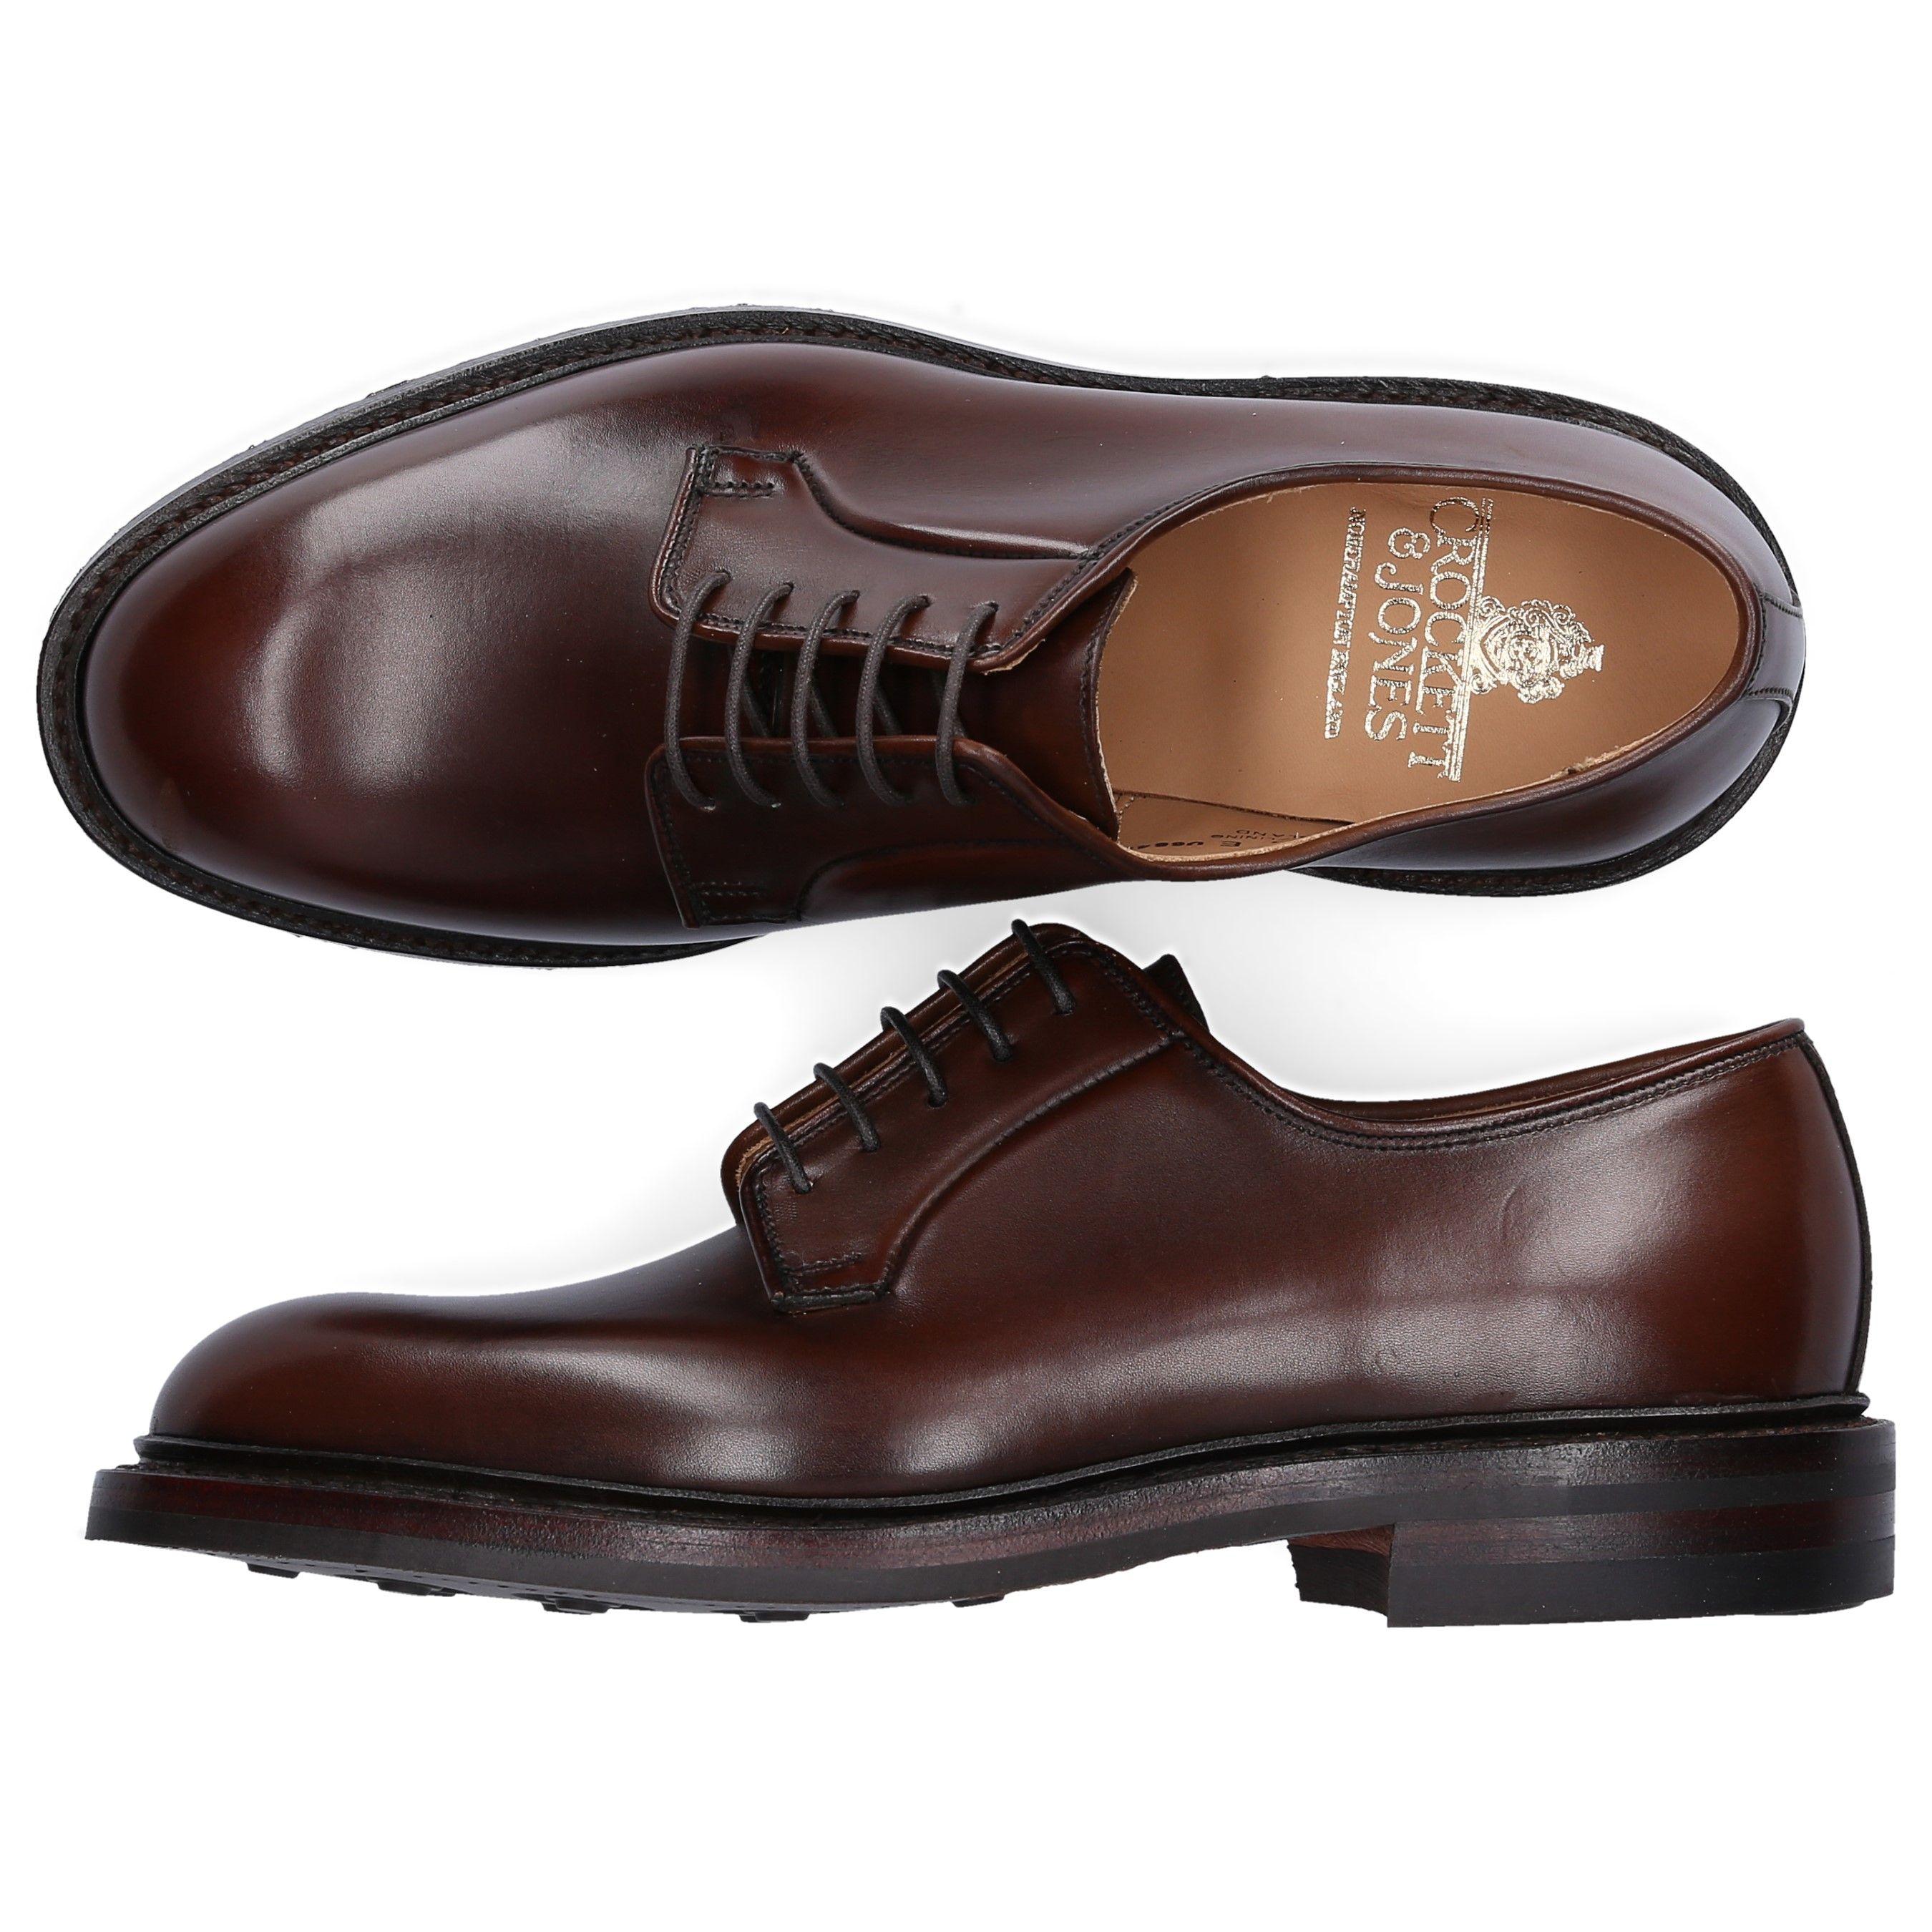 Crockett \u0026 Jones Business Shoes Derby